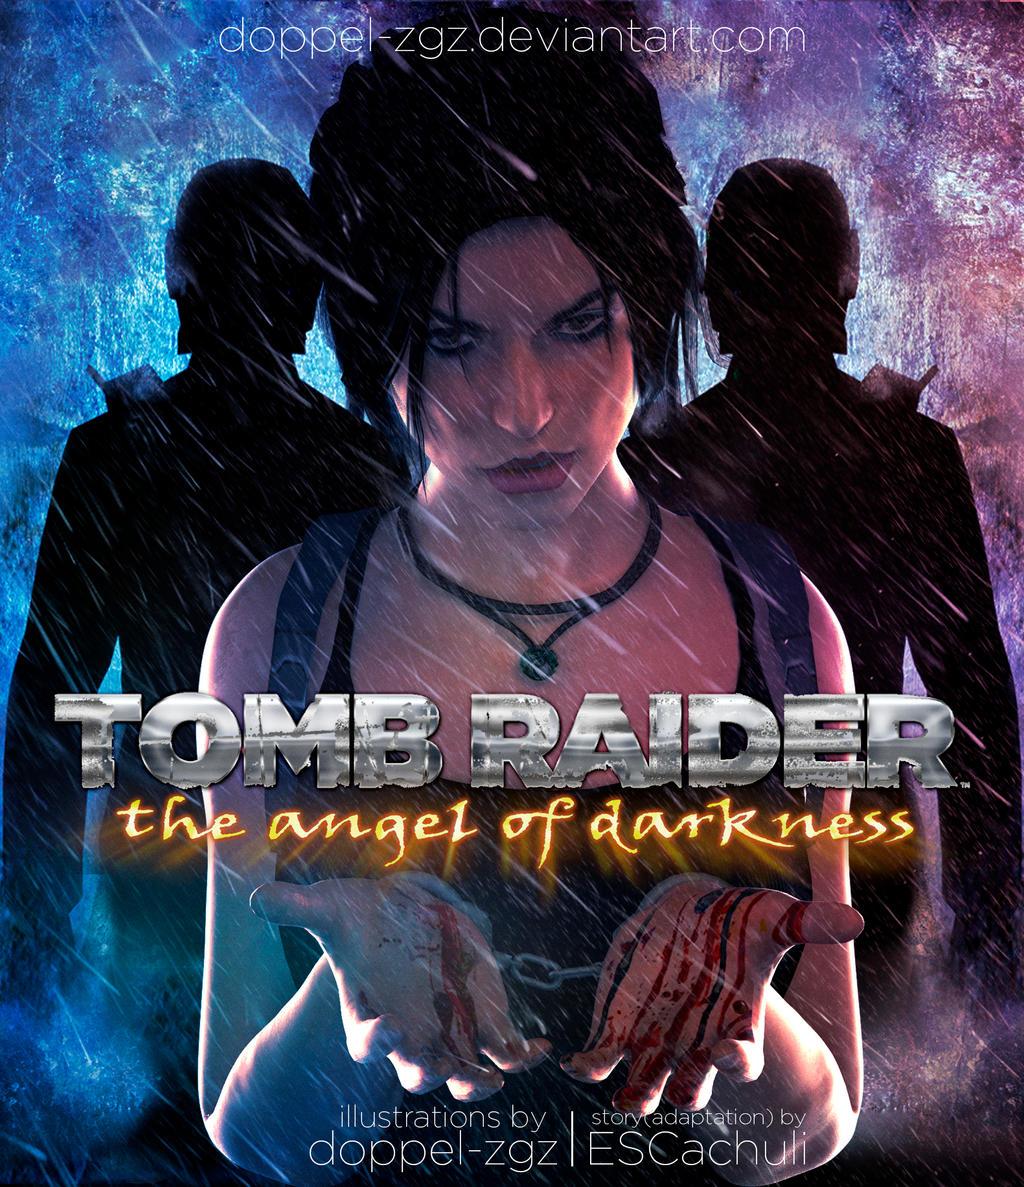 Tomb Rider Wallpaper: Tomb Raider: The Angel Of Darkness (Reborn) By DoppeL-zgz